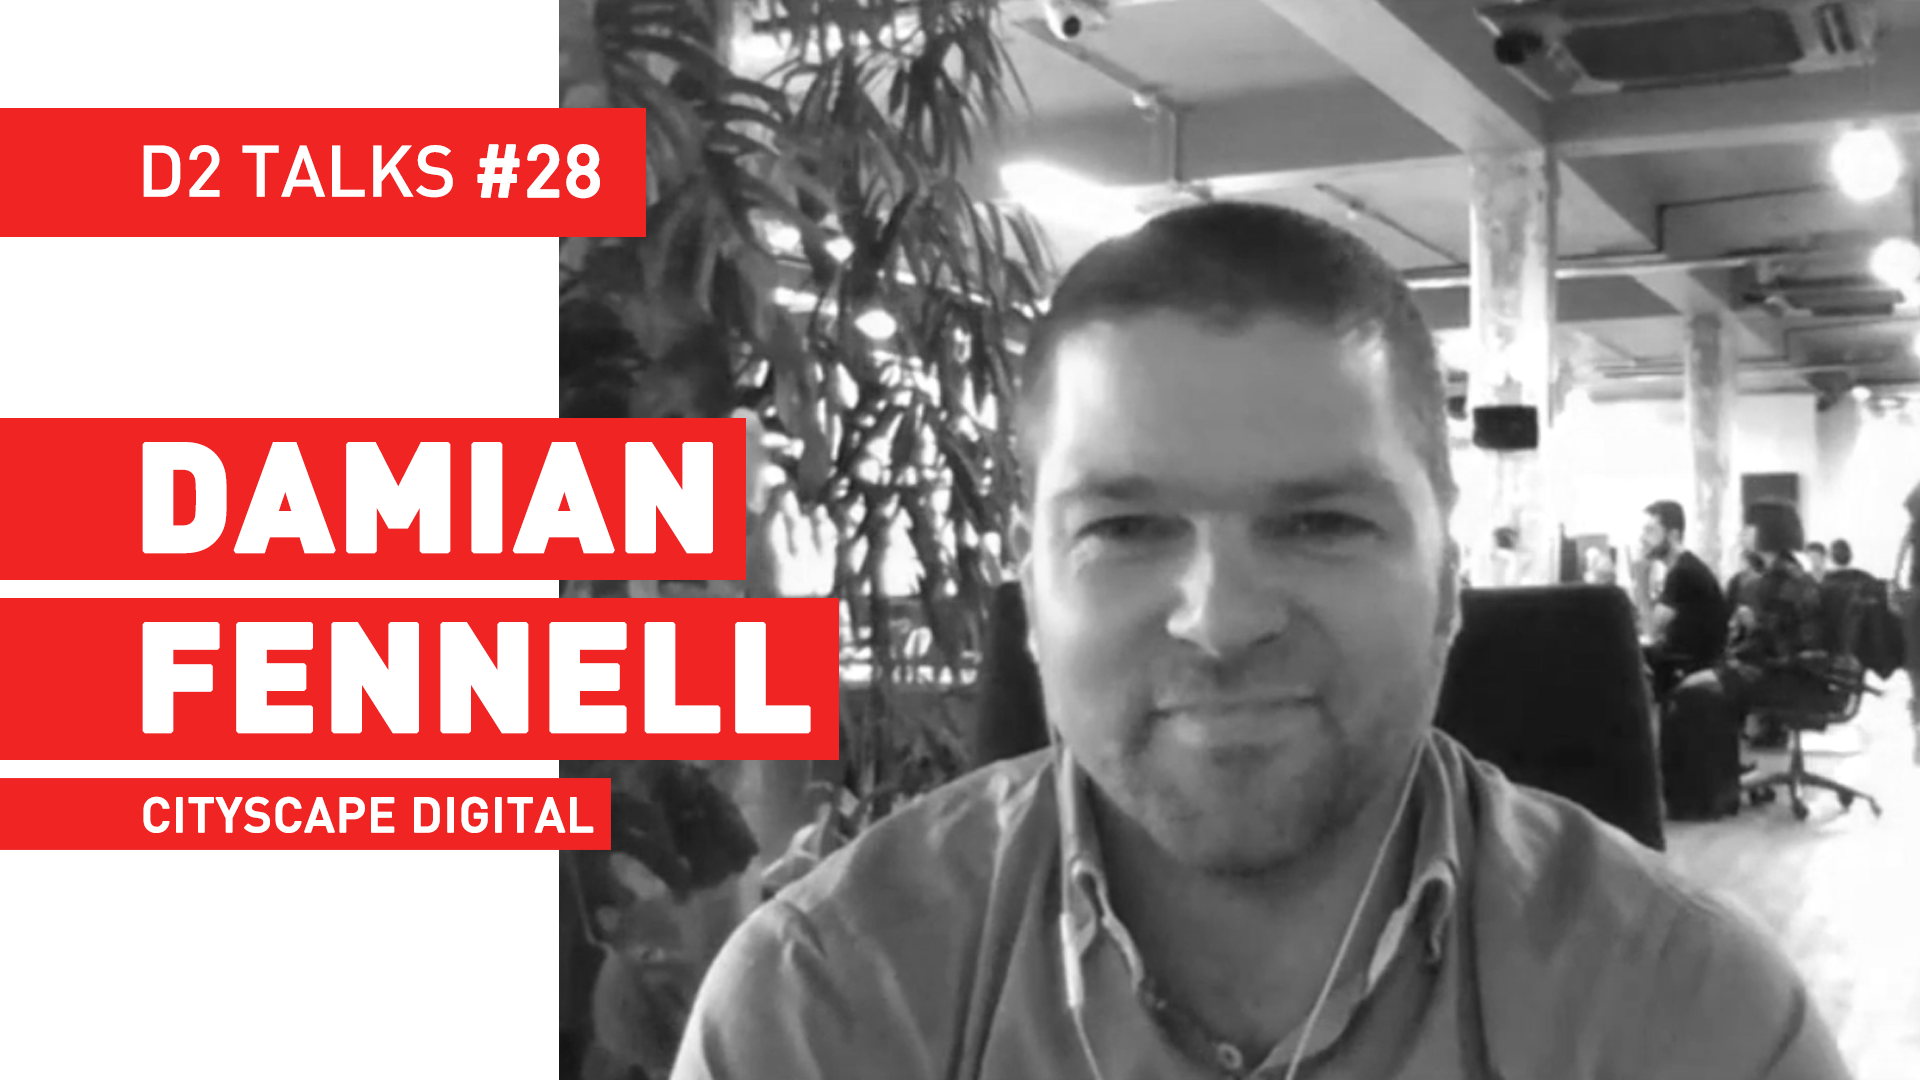 D2 Talks #28: Damian Fennell of Cityscape Digital